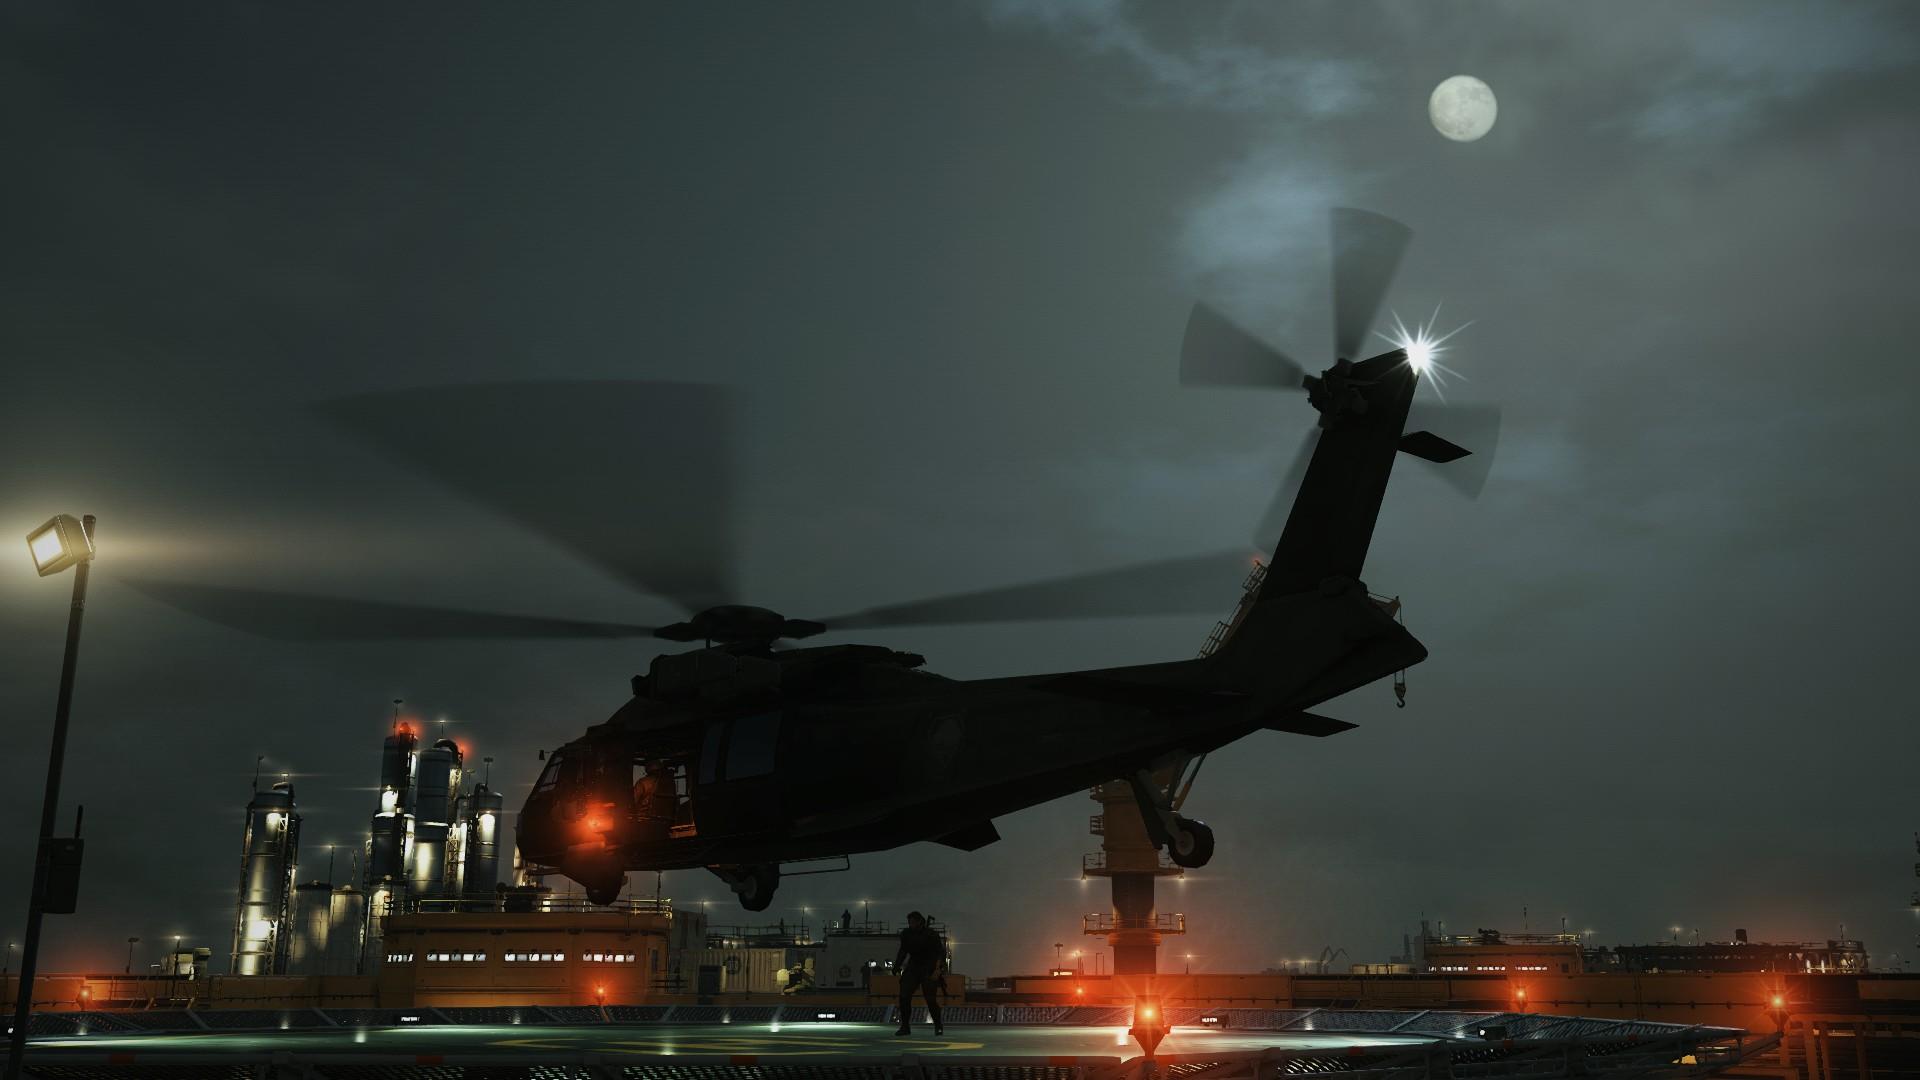 загруженное (16).jpg - Metal Gear Solid 5: The Phantom Pain